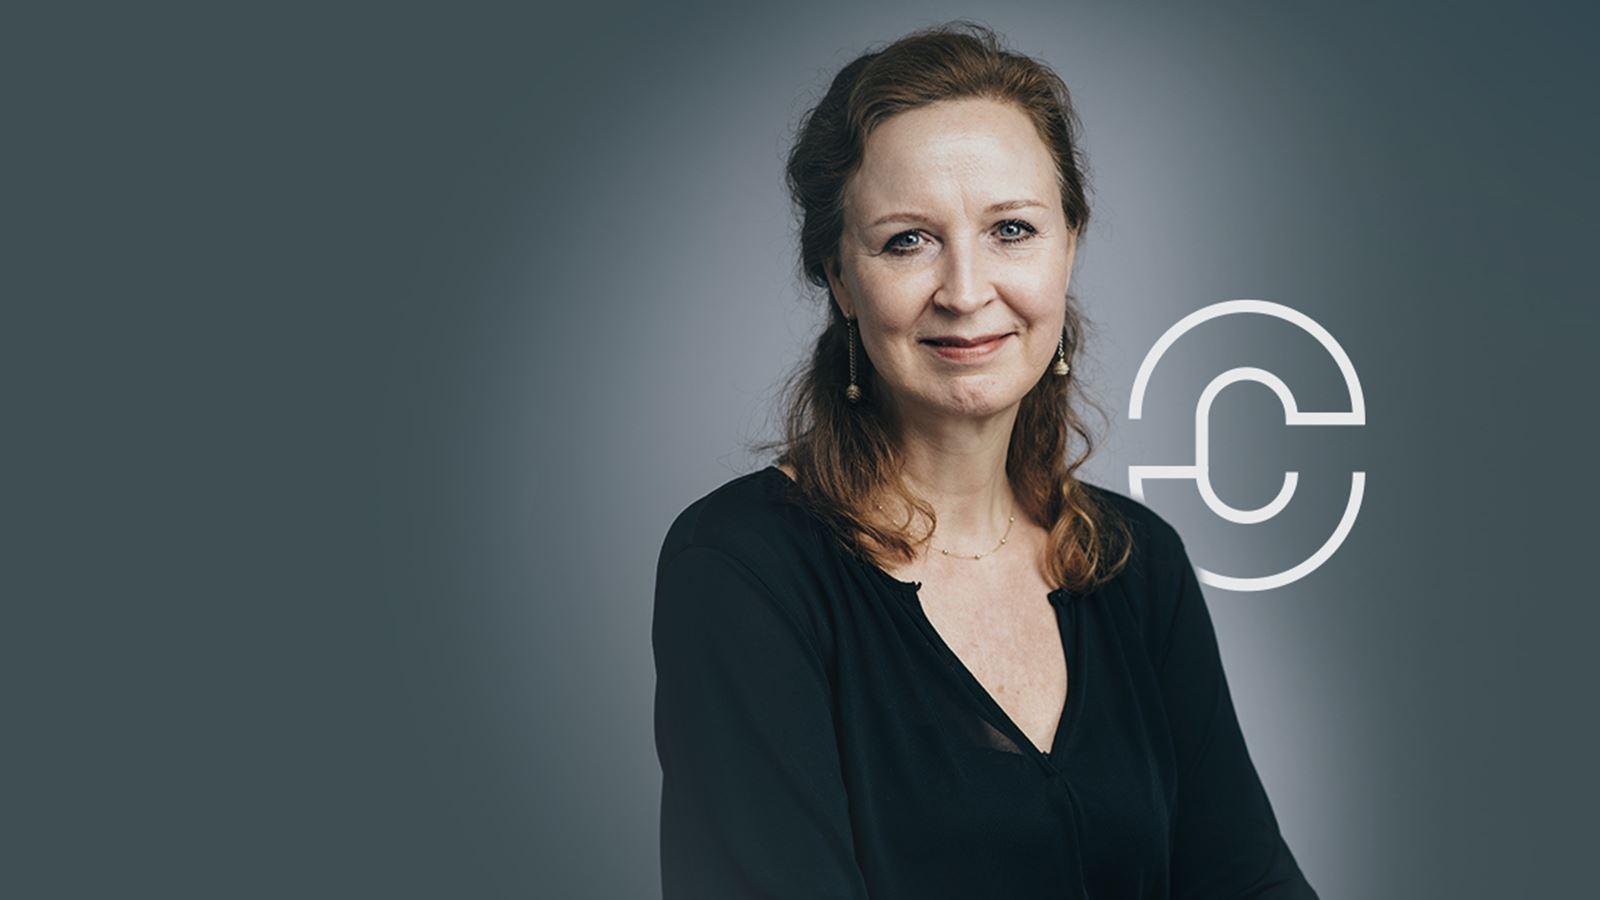 Cecile Huijnen